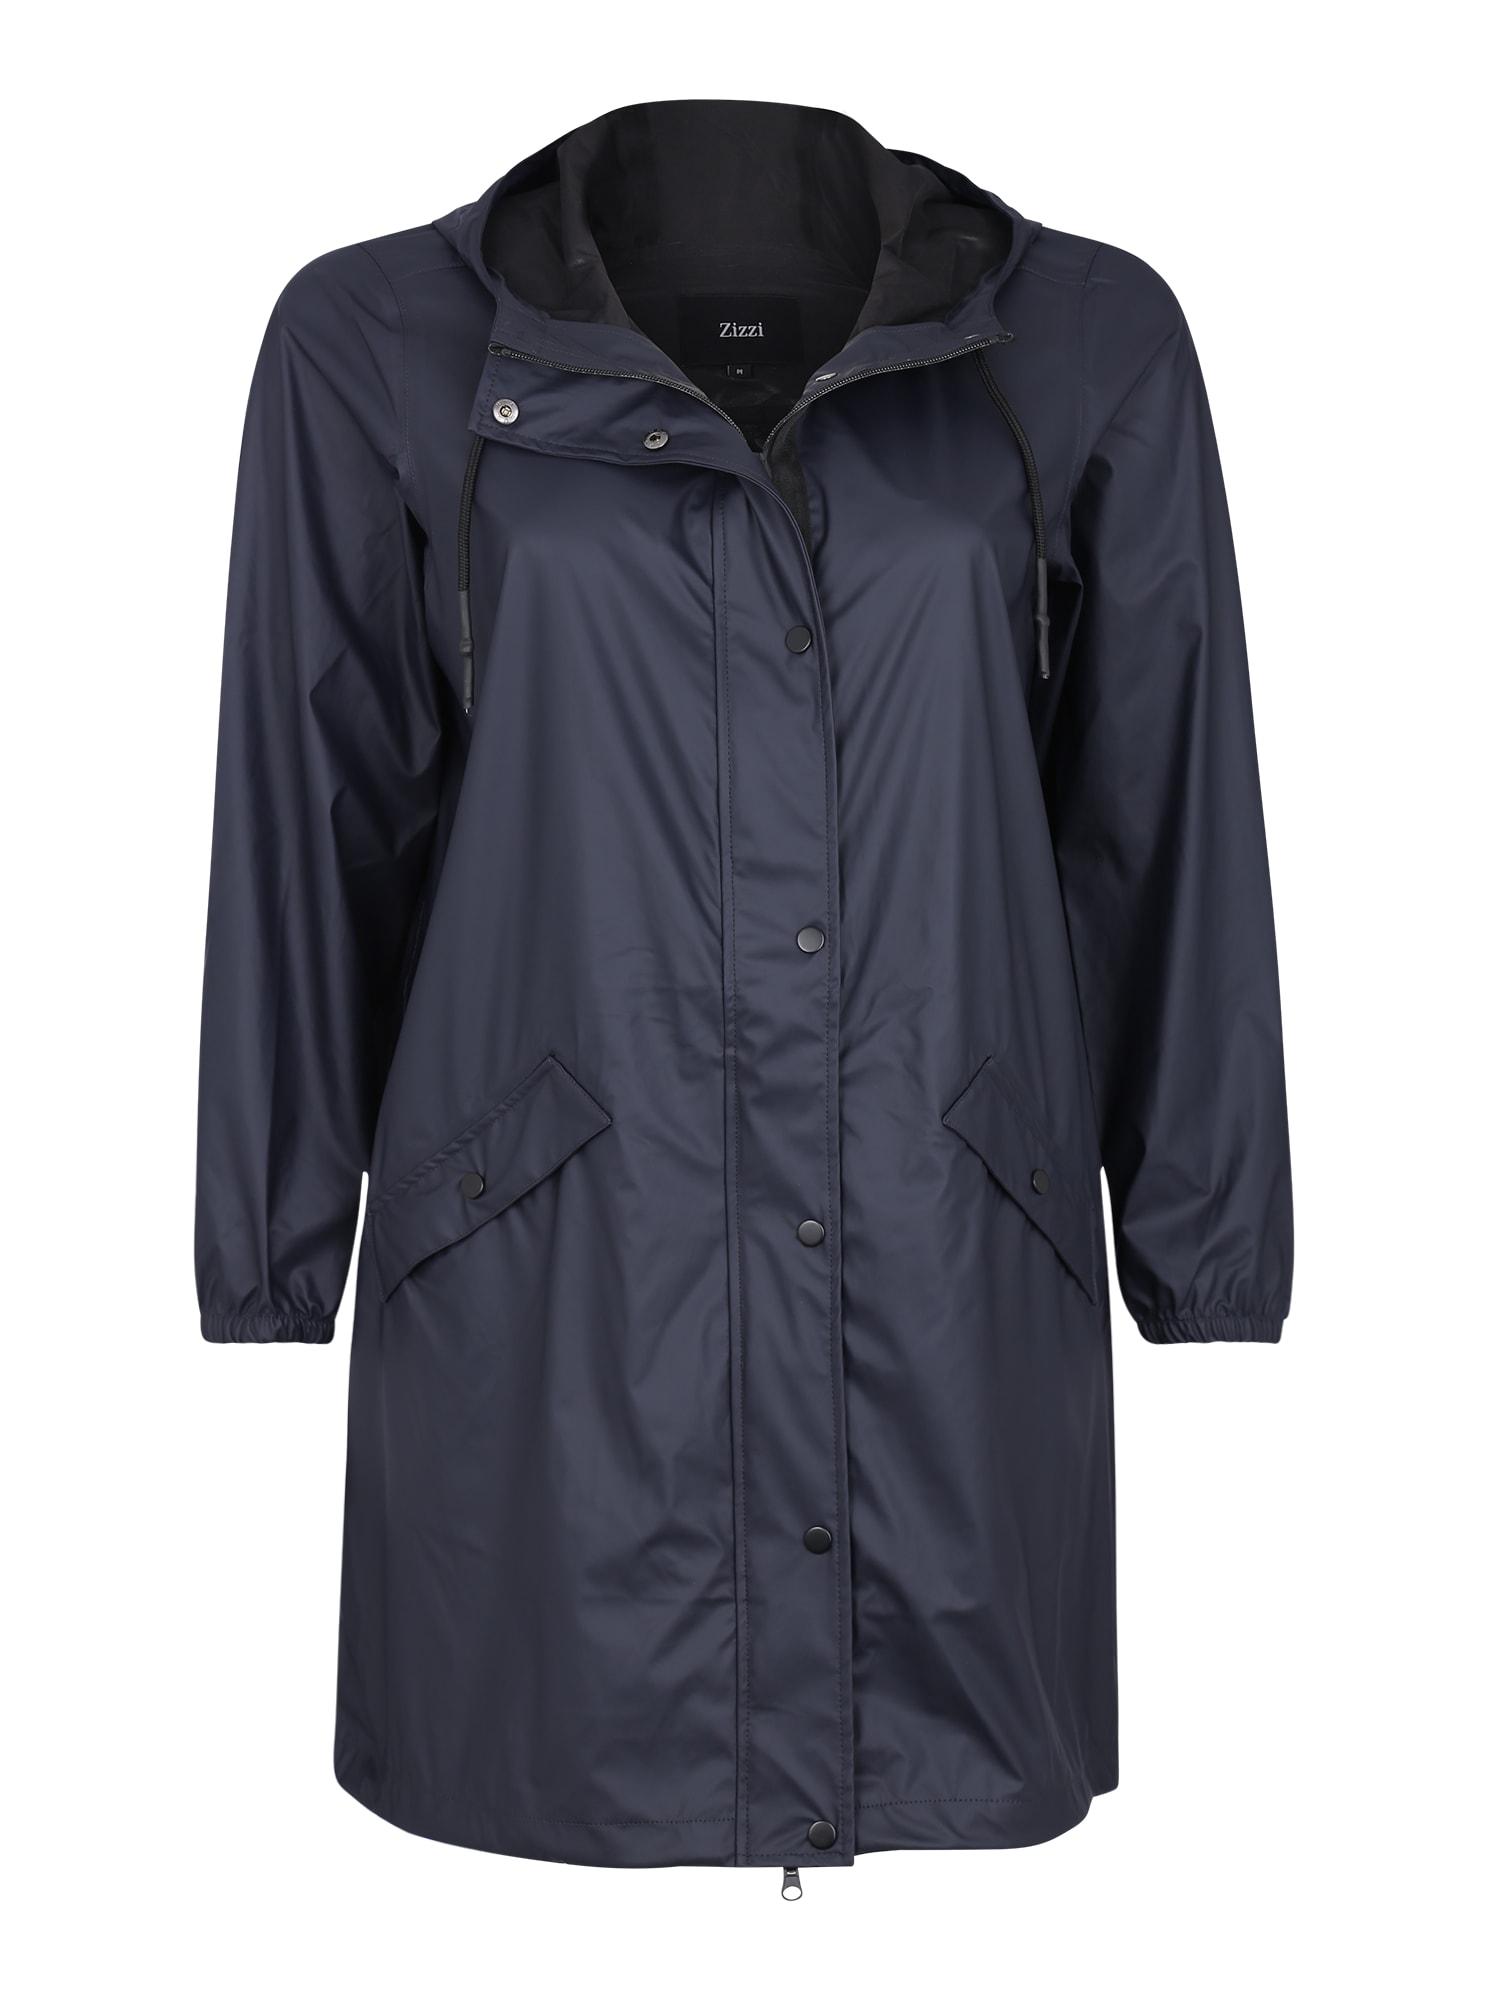 Regenmantel | Sportbekleidung > Sportmäntel > Regenmäntel | Zizzi